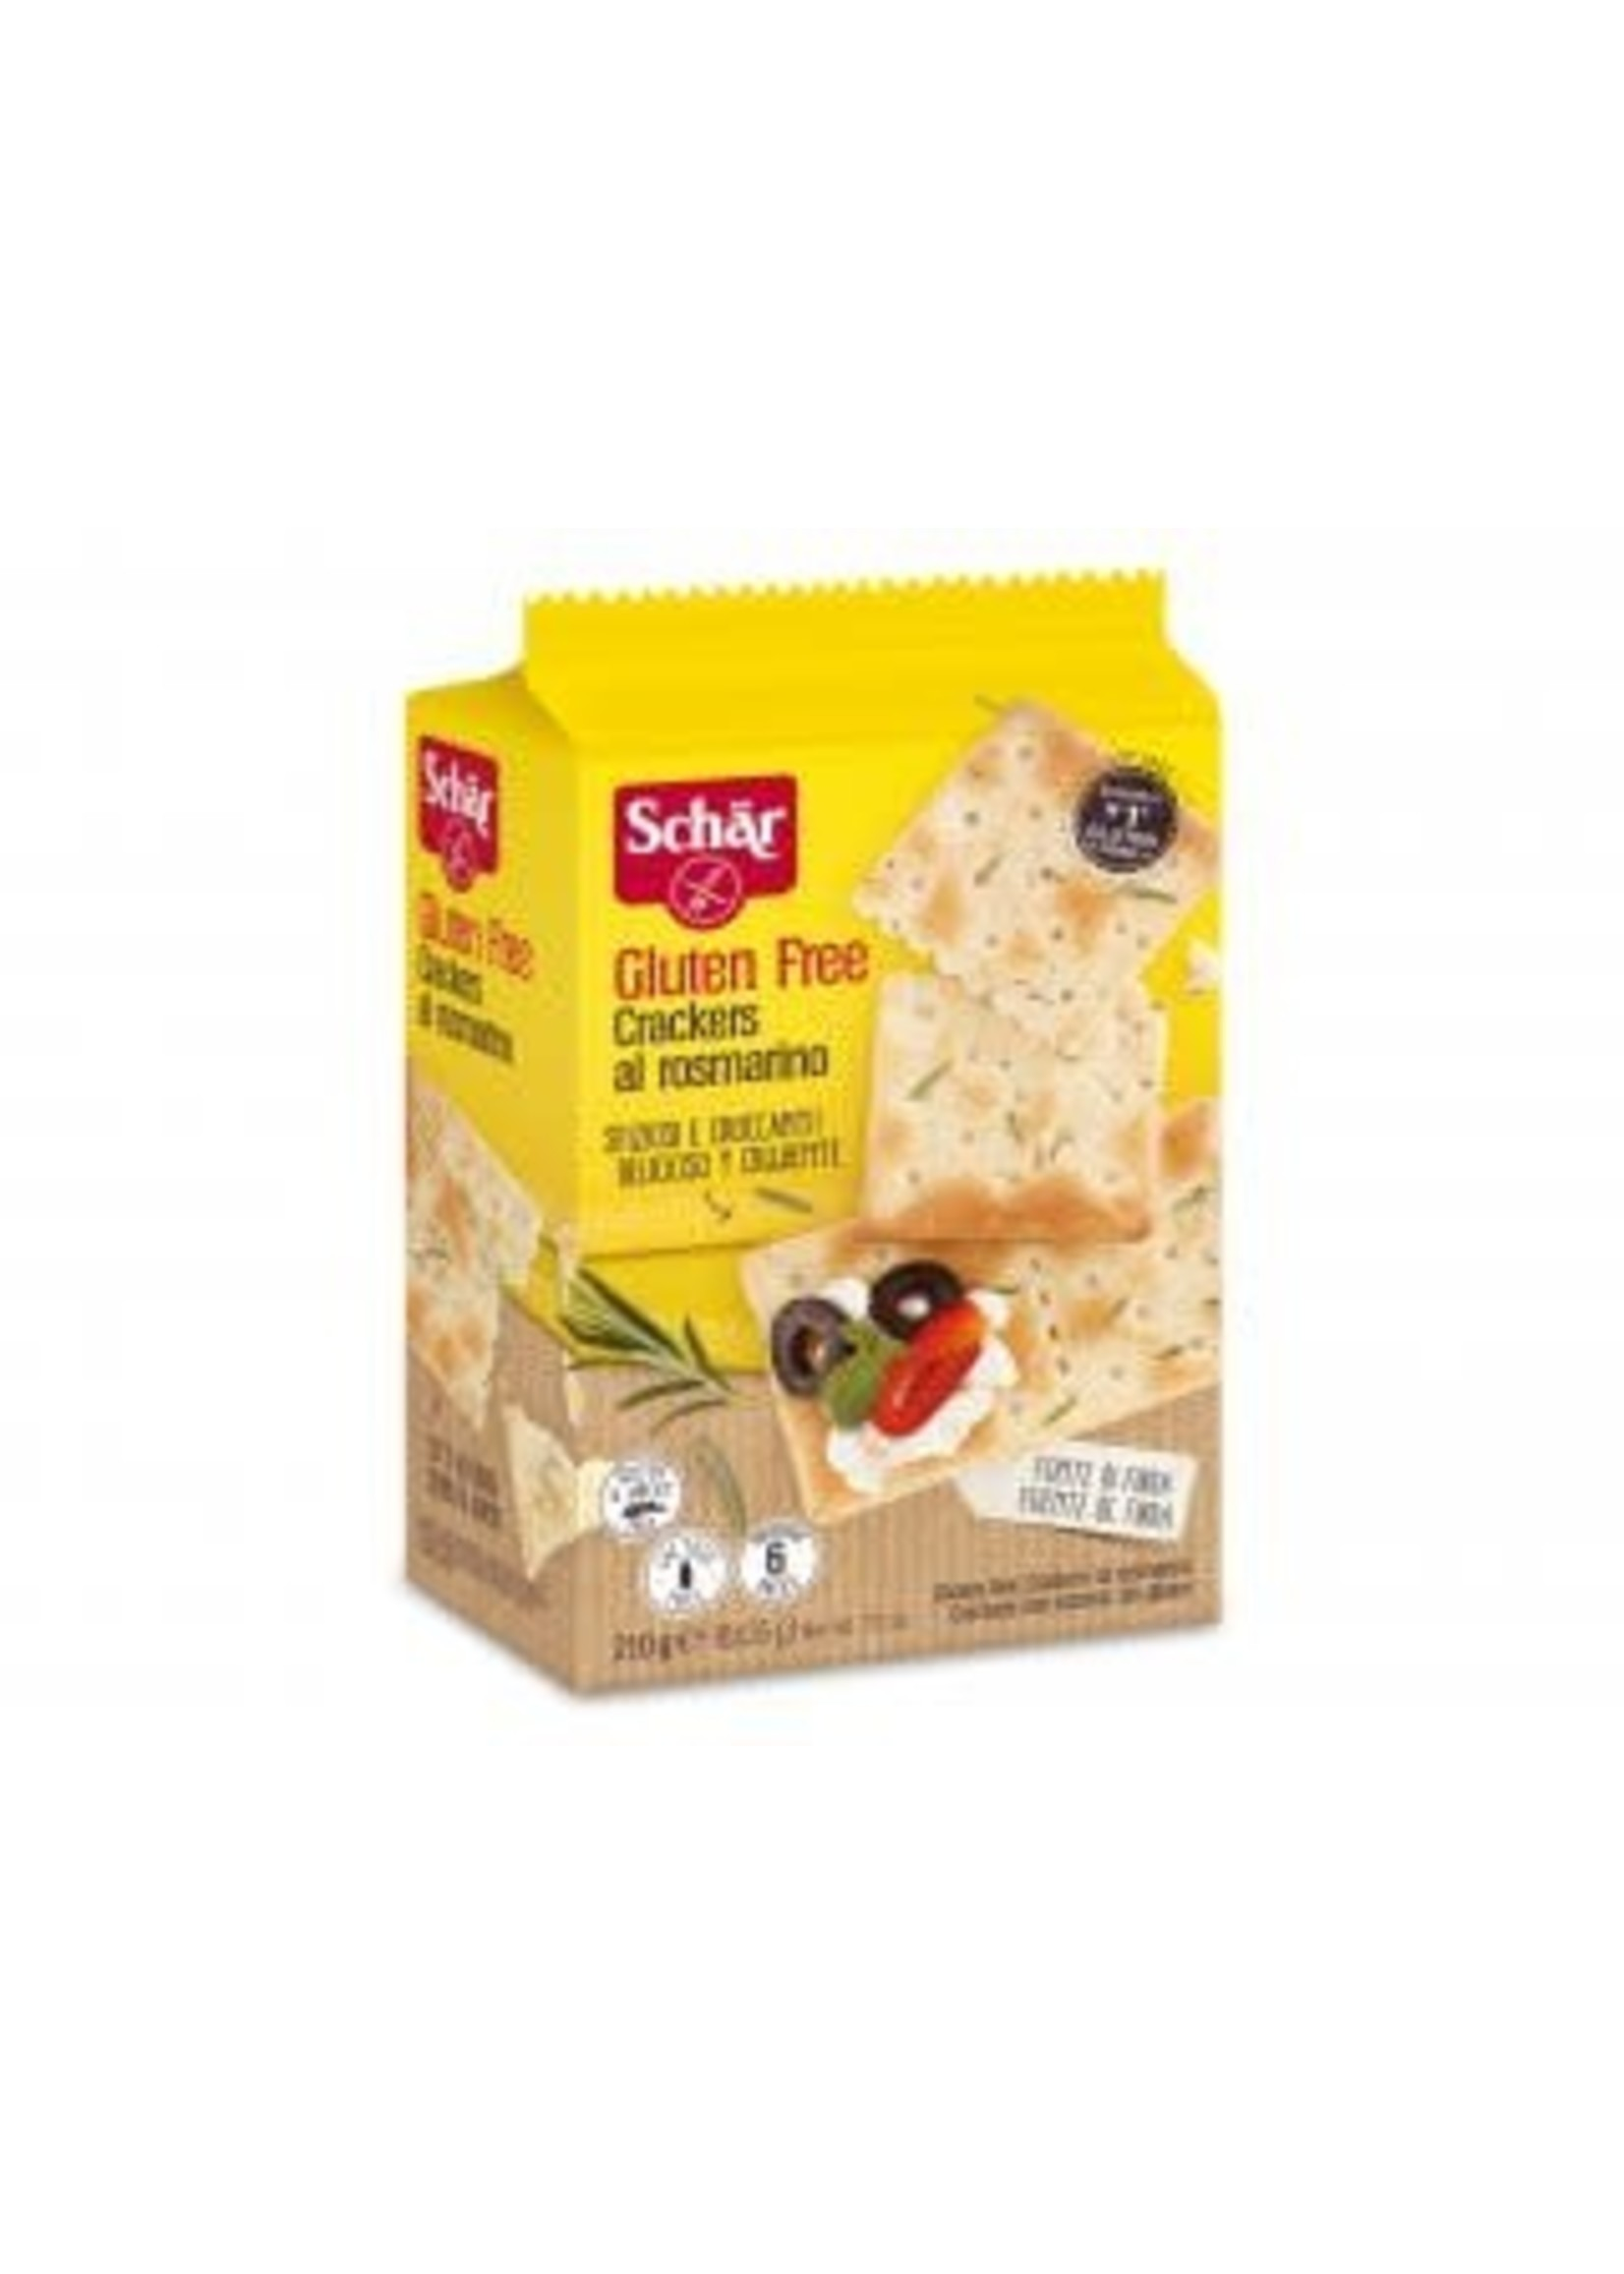 Schar Gluten Free Cracker Rosemary